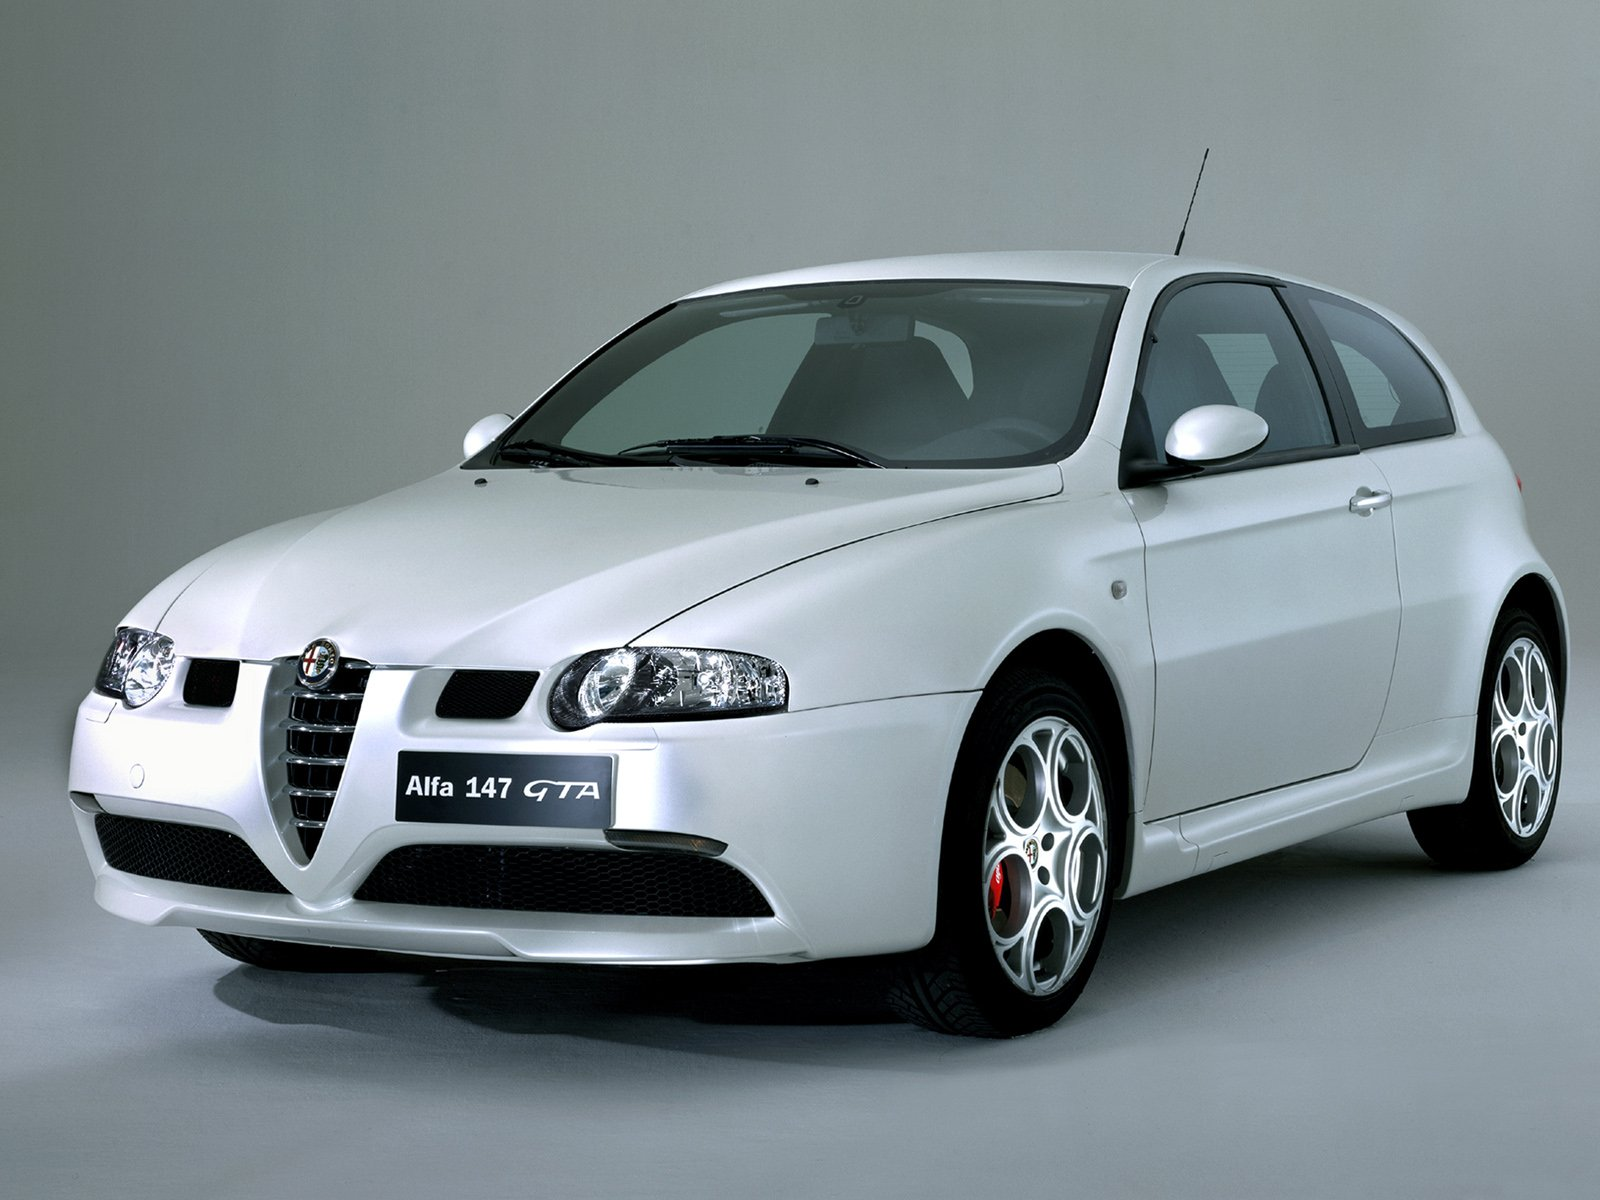 http://4.bp.blogspot.com/-2YKfrK7onAU/T_N8o2CgraI/AAAAAAAACMw/XVc_UGWA6jE/s1600/voiture-alfa-romeo-147-gta.jpg